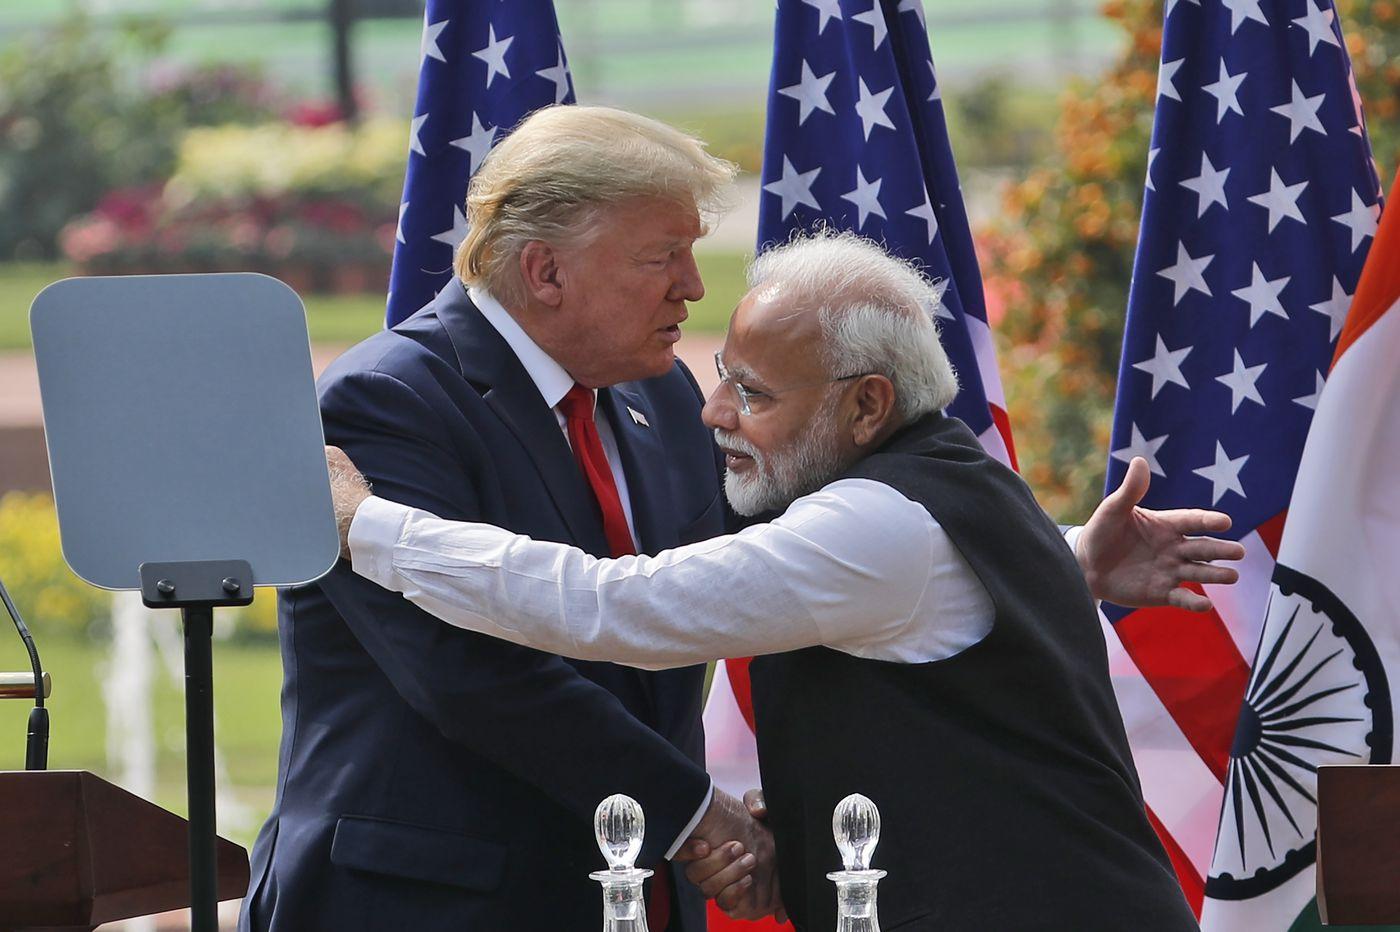 Trump defends Modi, talks domestic squabbles and trade on India trip